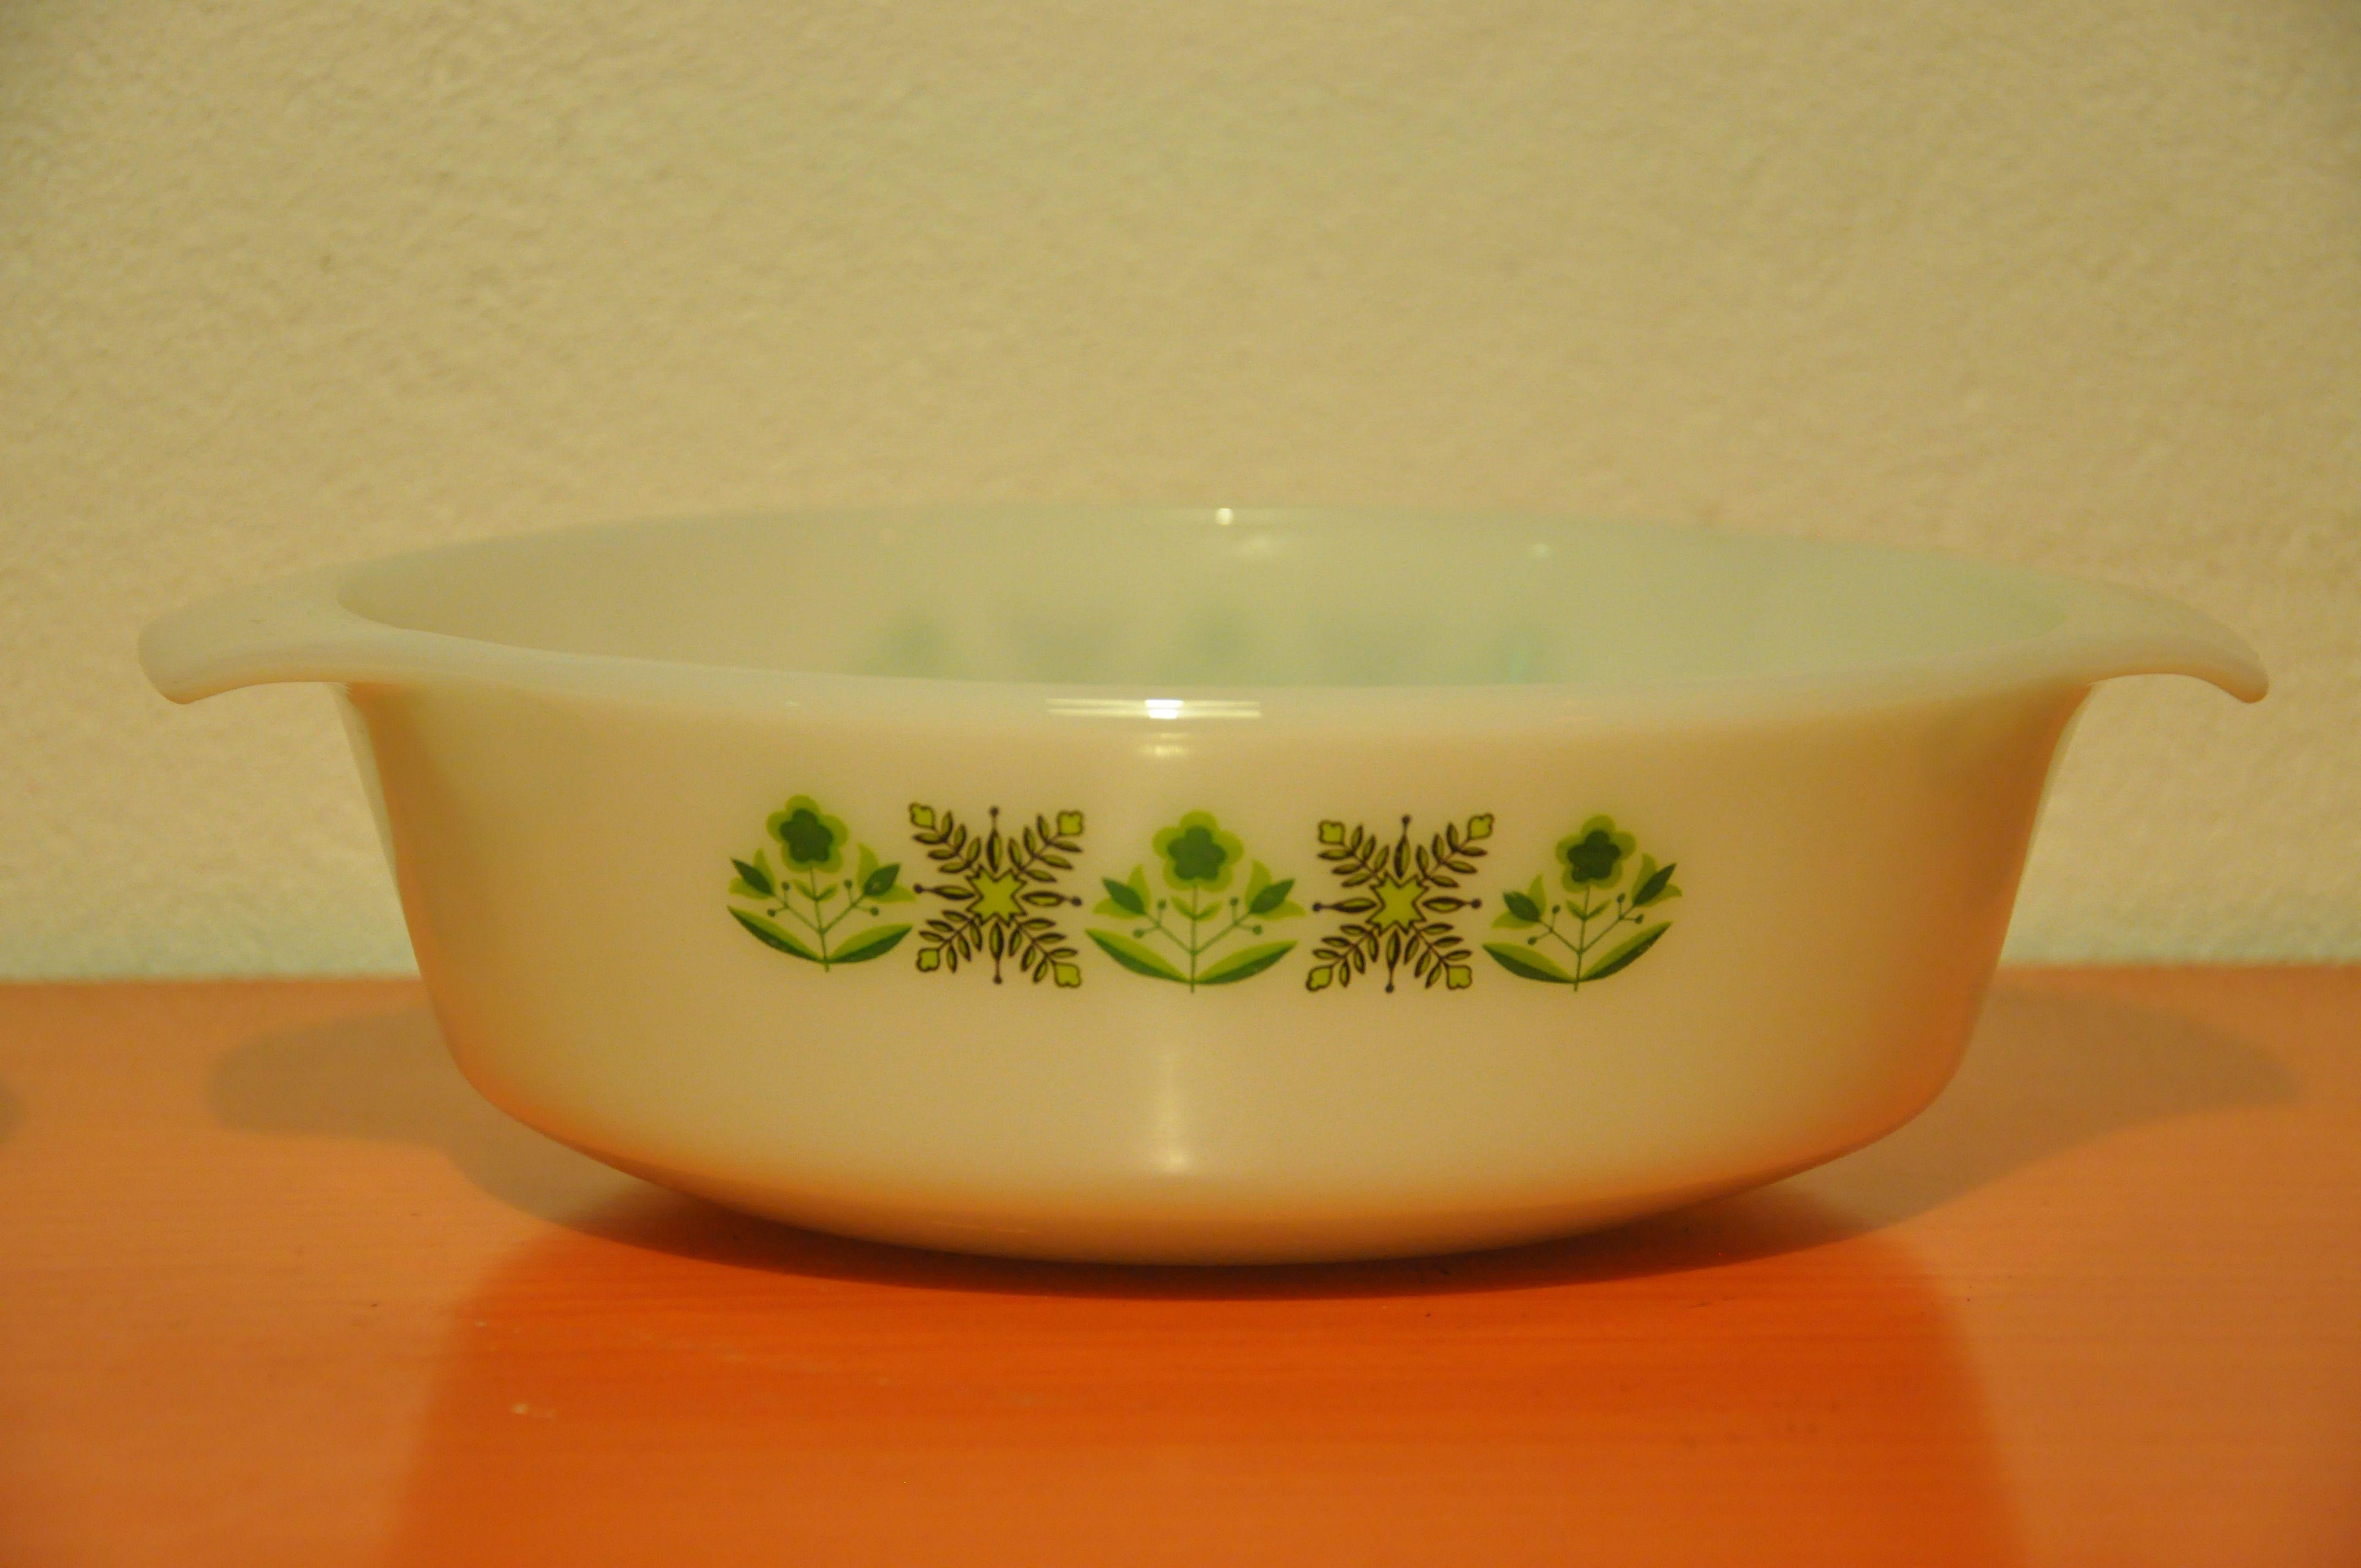 Anchor Hocking 'Fire King' milk glass casserole dish 1950's.